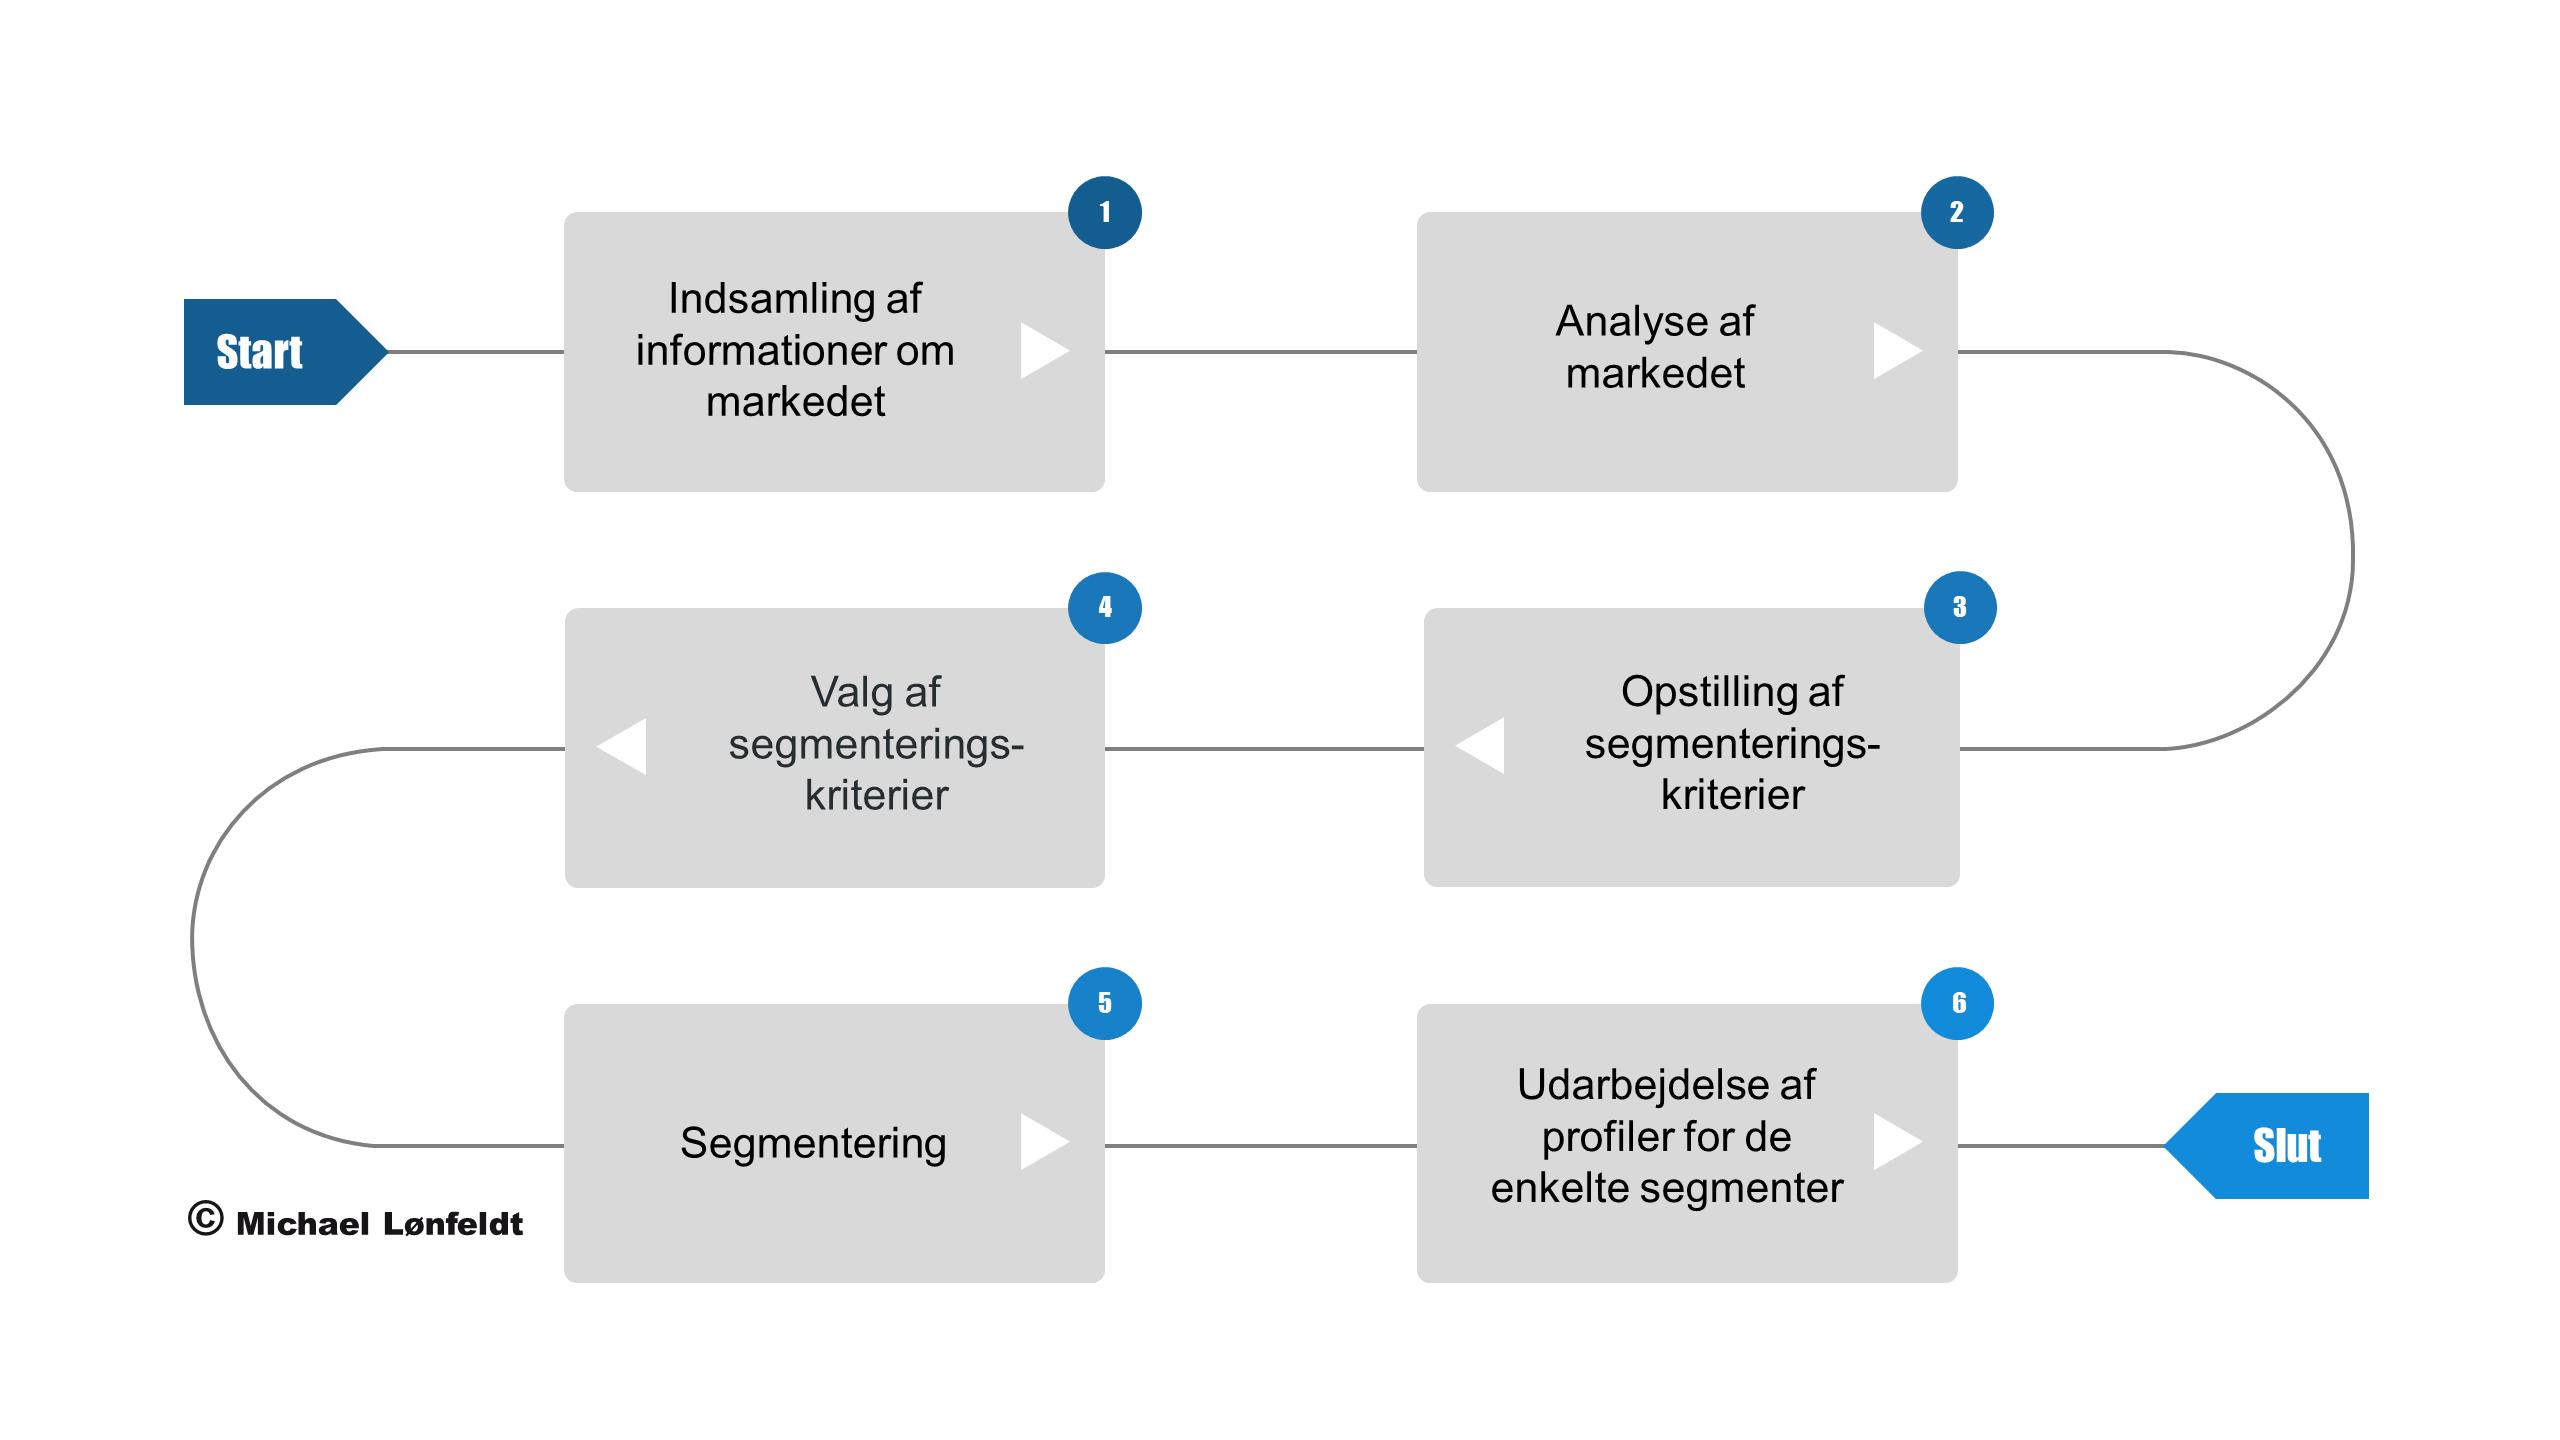 Segmentering arbejdsproces segmenteringskriterier segment